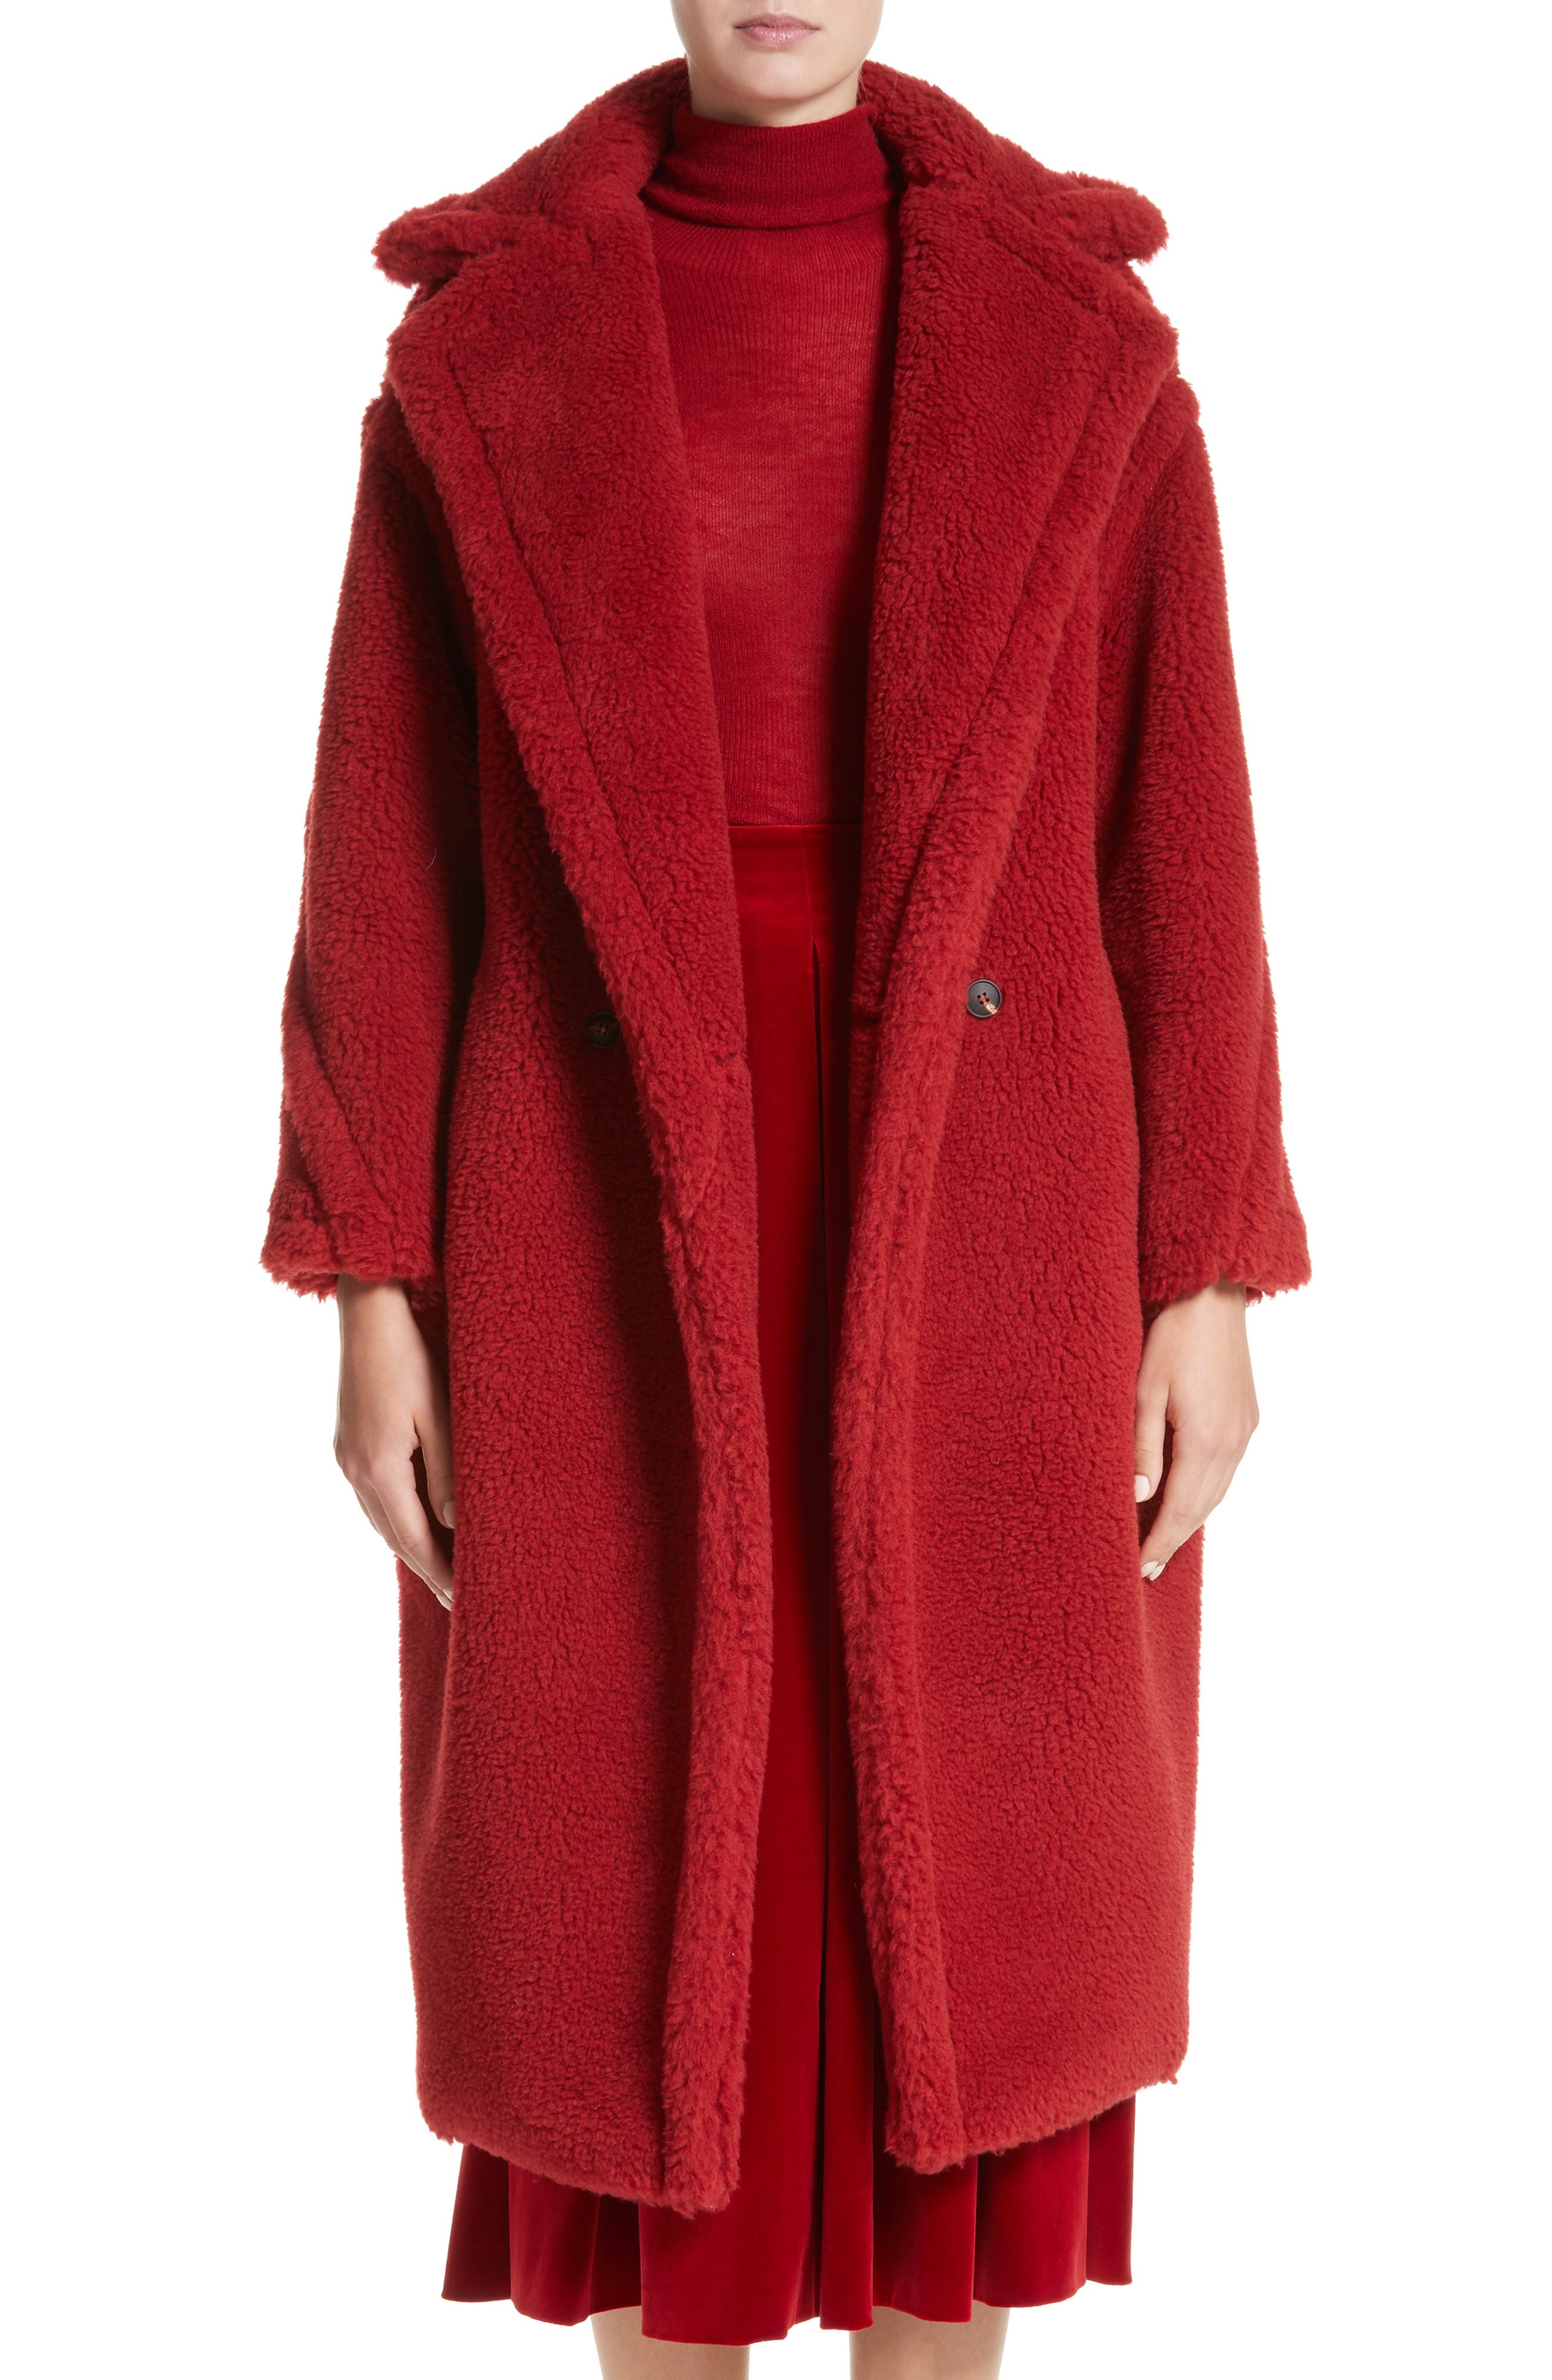 Pappino Camel Hair & Silk Coat,                         Main,                         color, 614